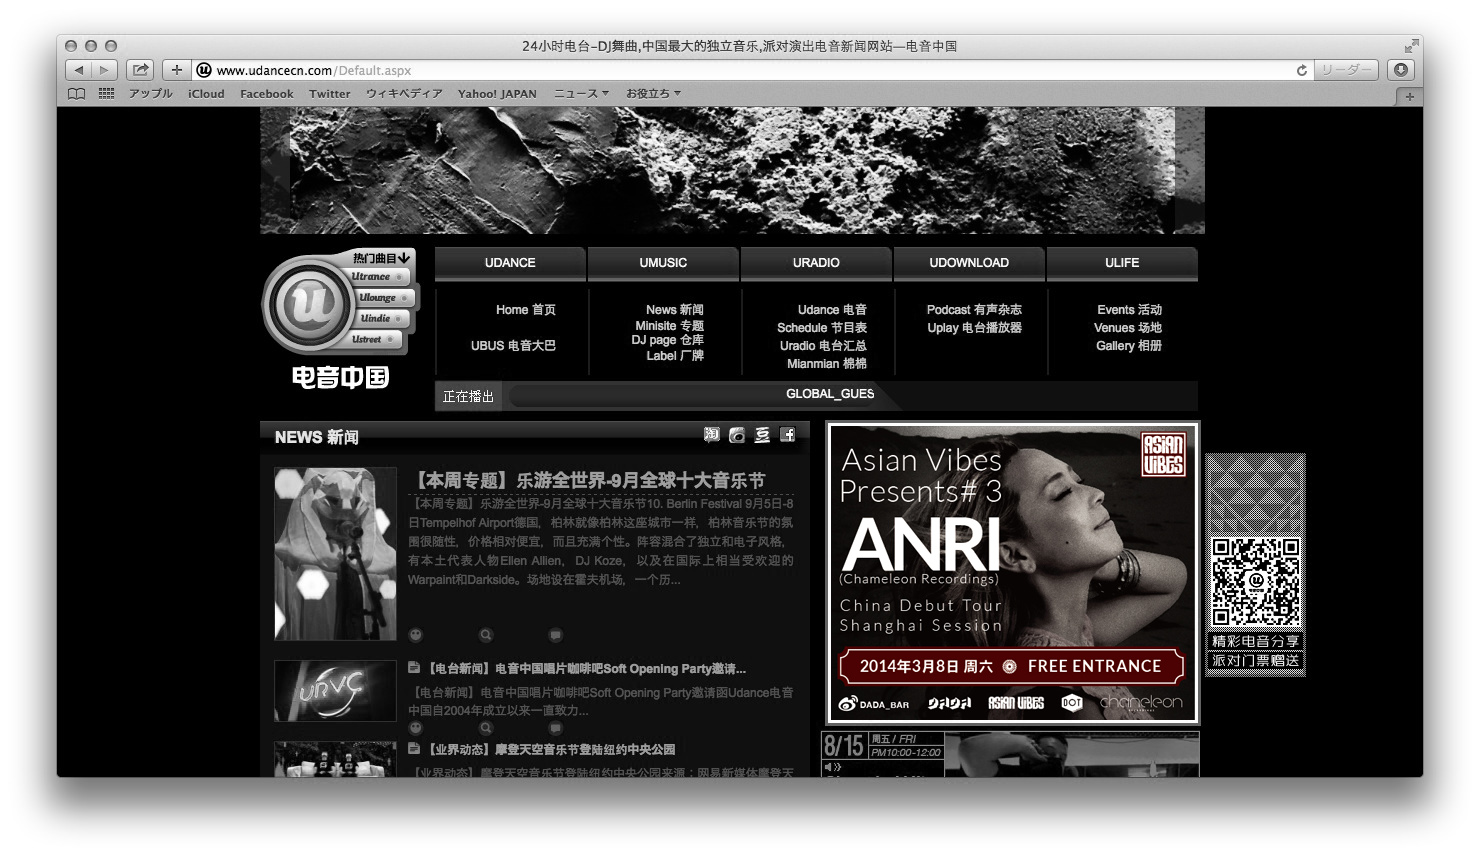 20140211Asiancives anri--Udance